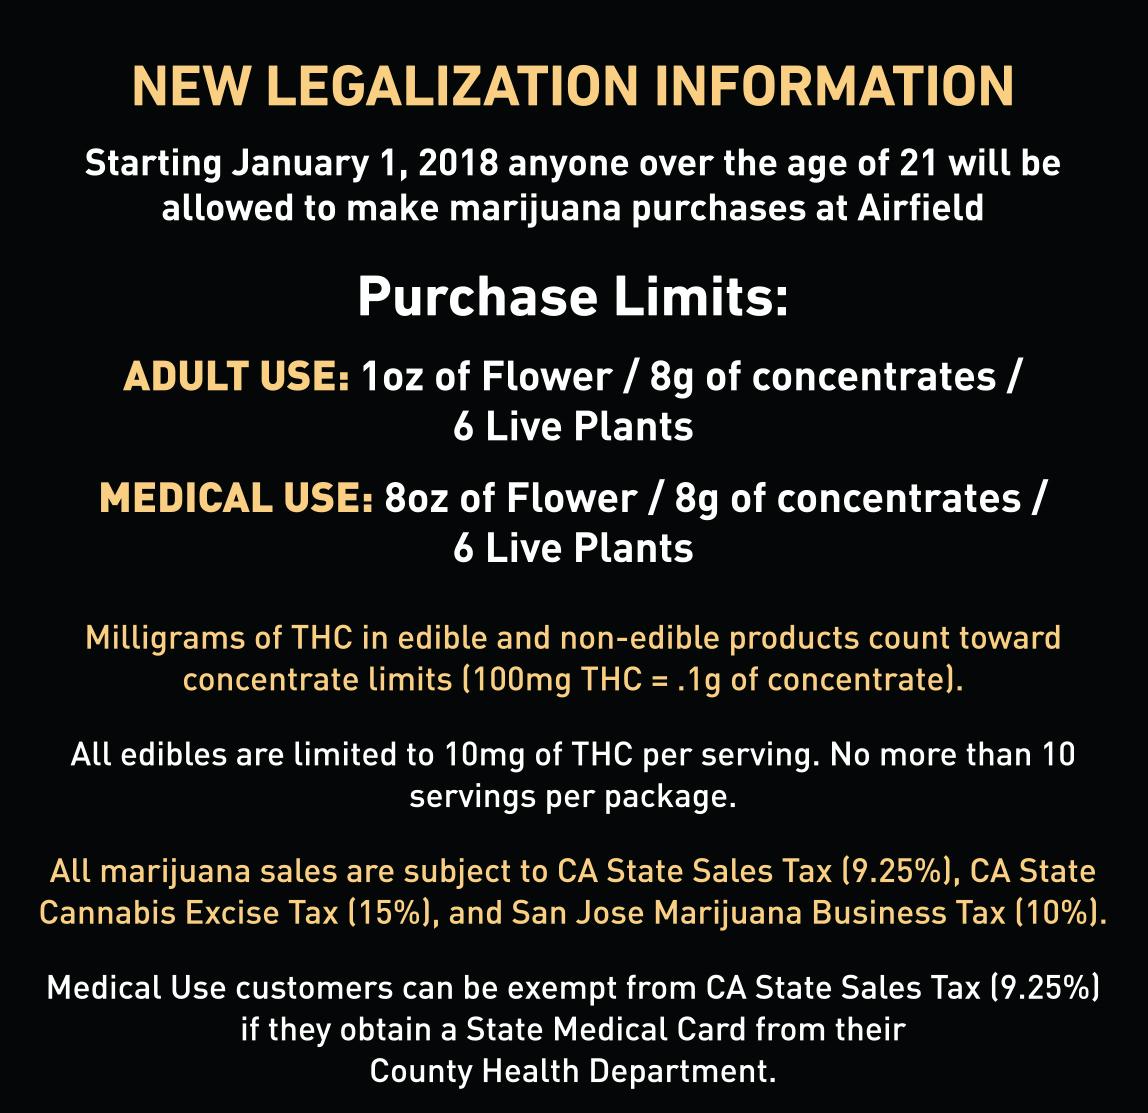 California Marijuana Legalization Purchasing Limits